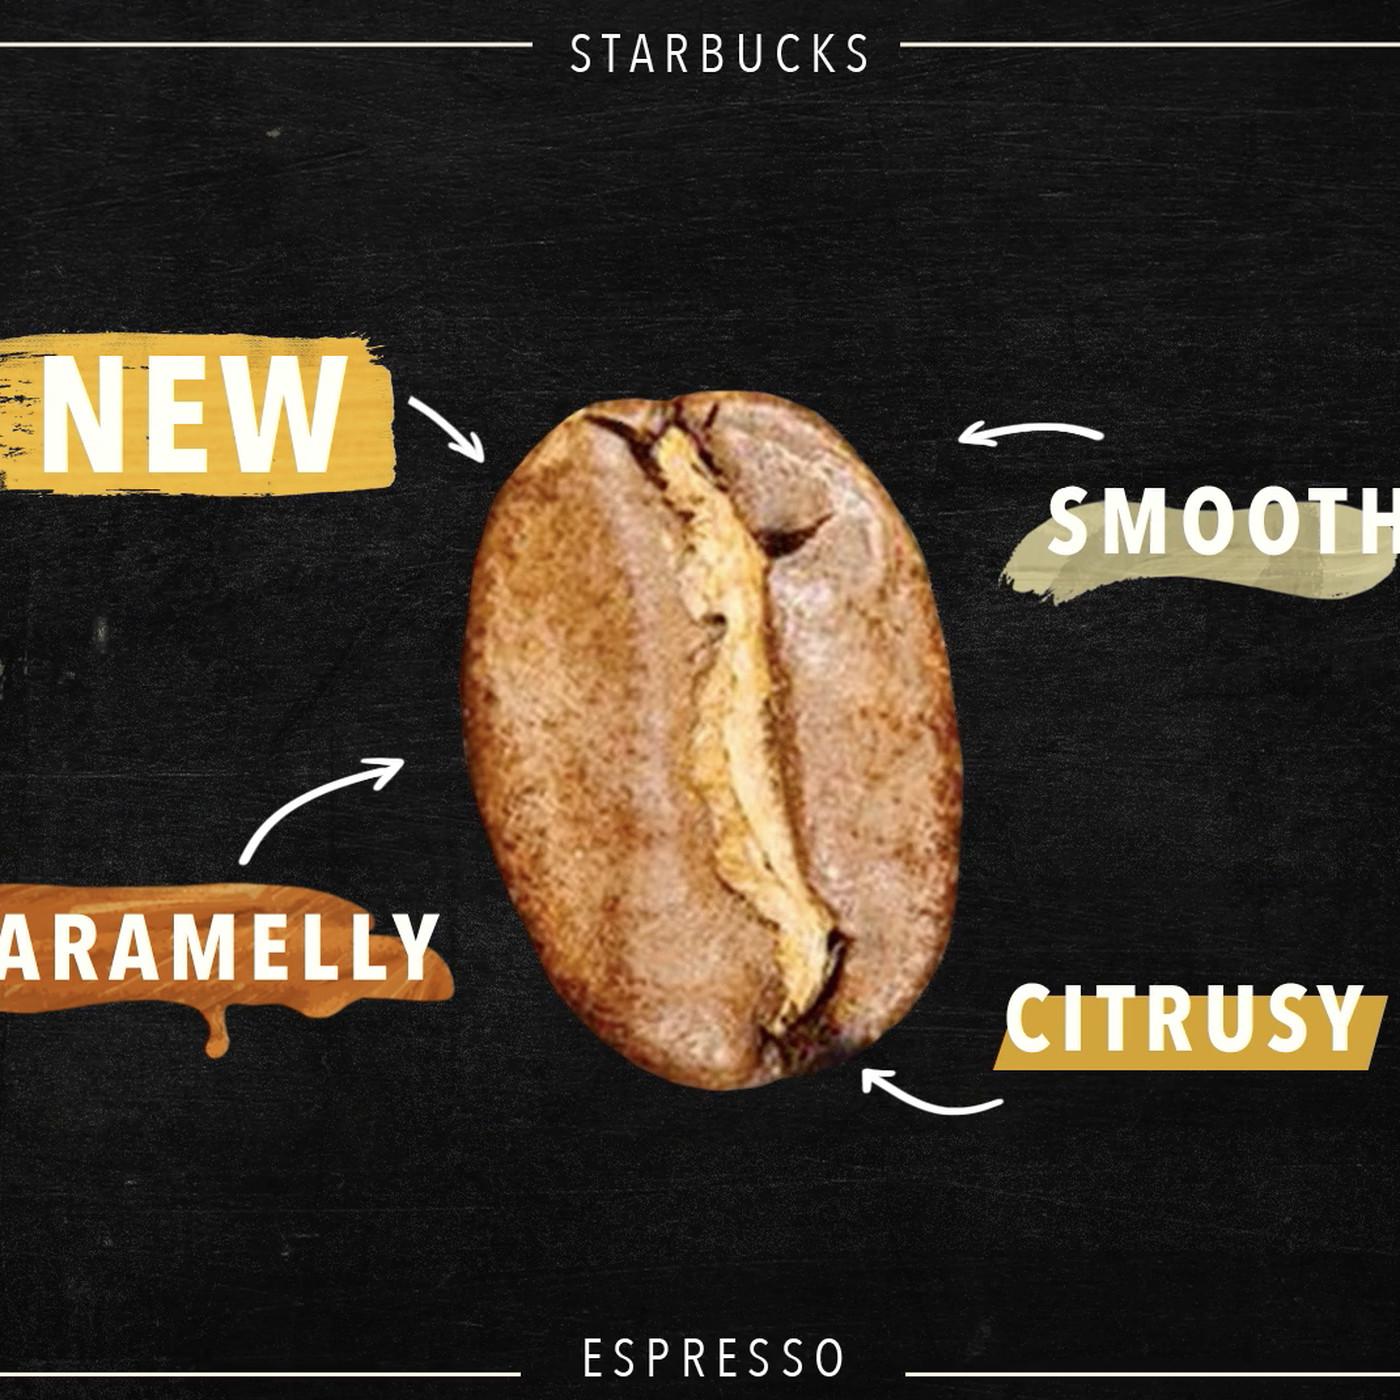 Here S How Starbucks Made The New Starbucks Blonde Espresso